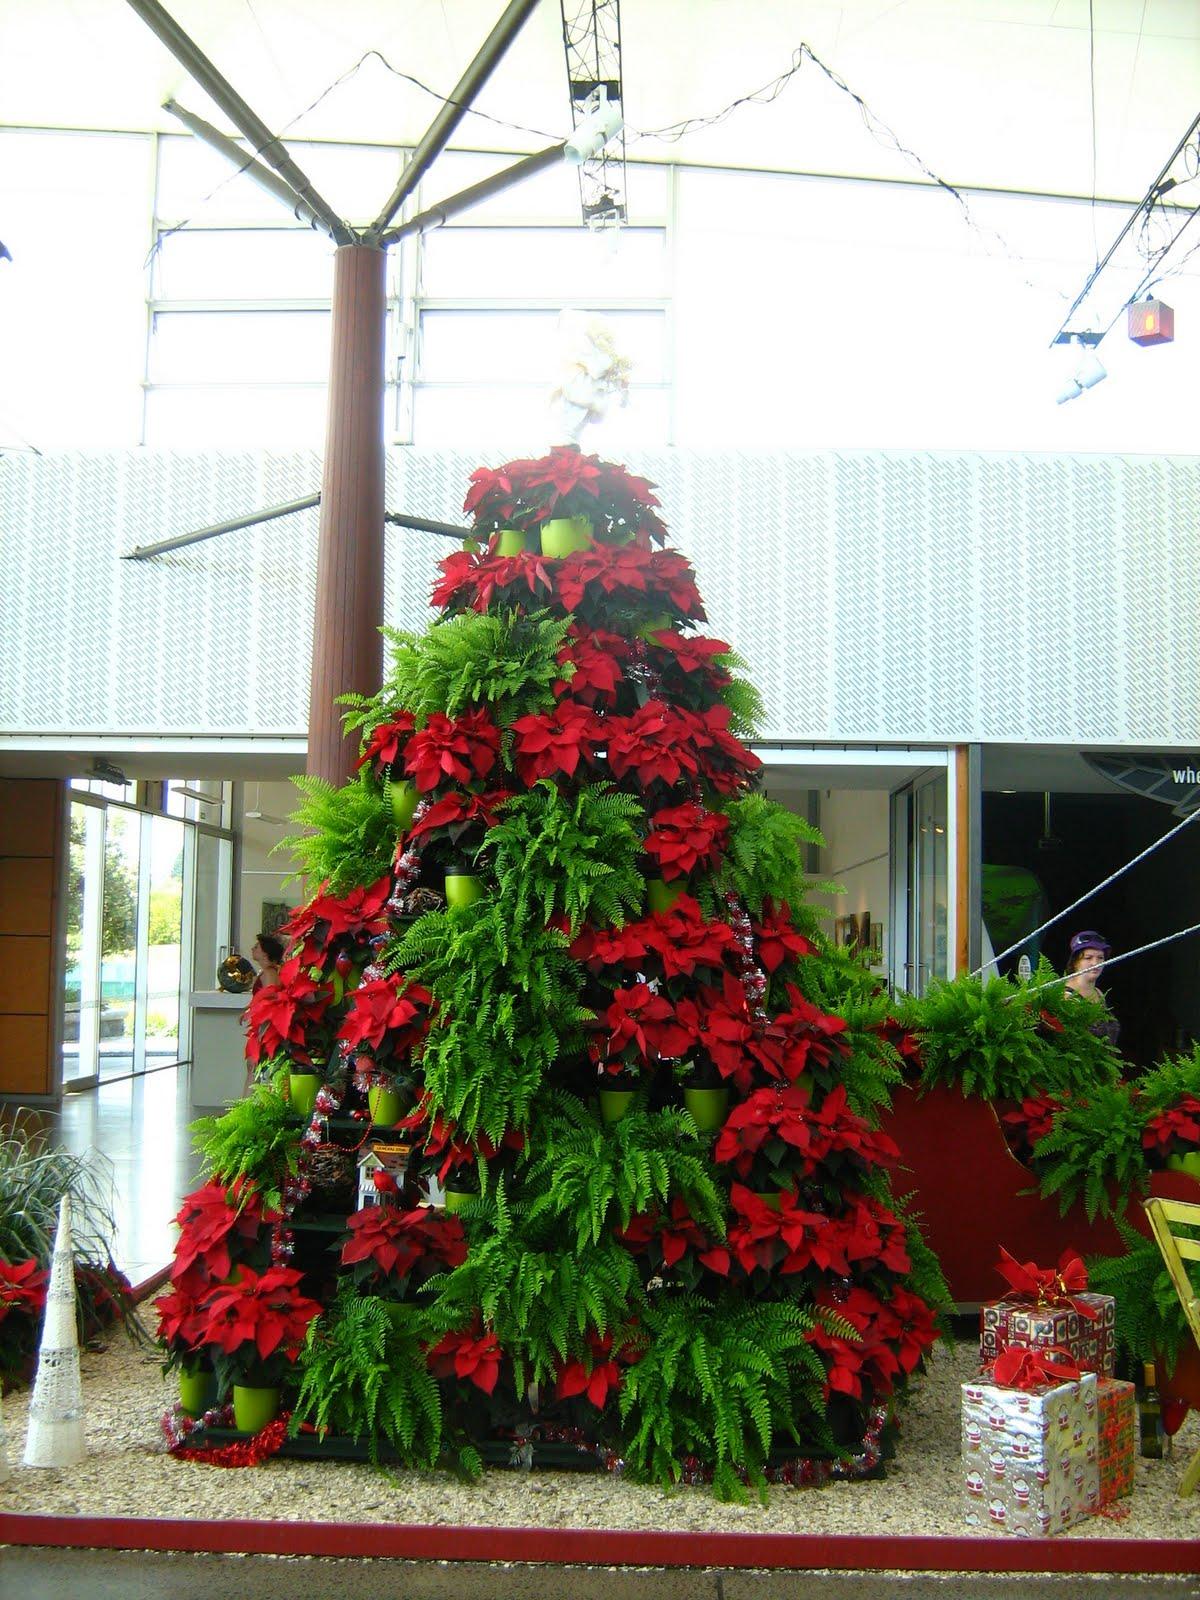 Poinsettia tree stand